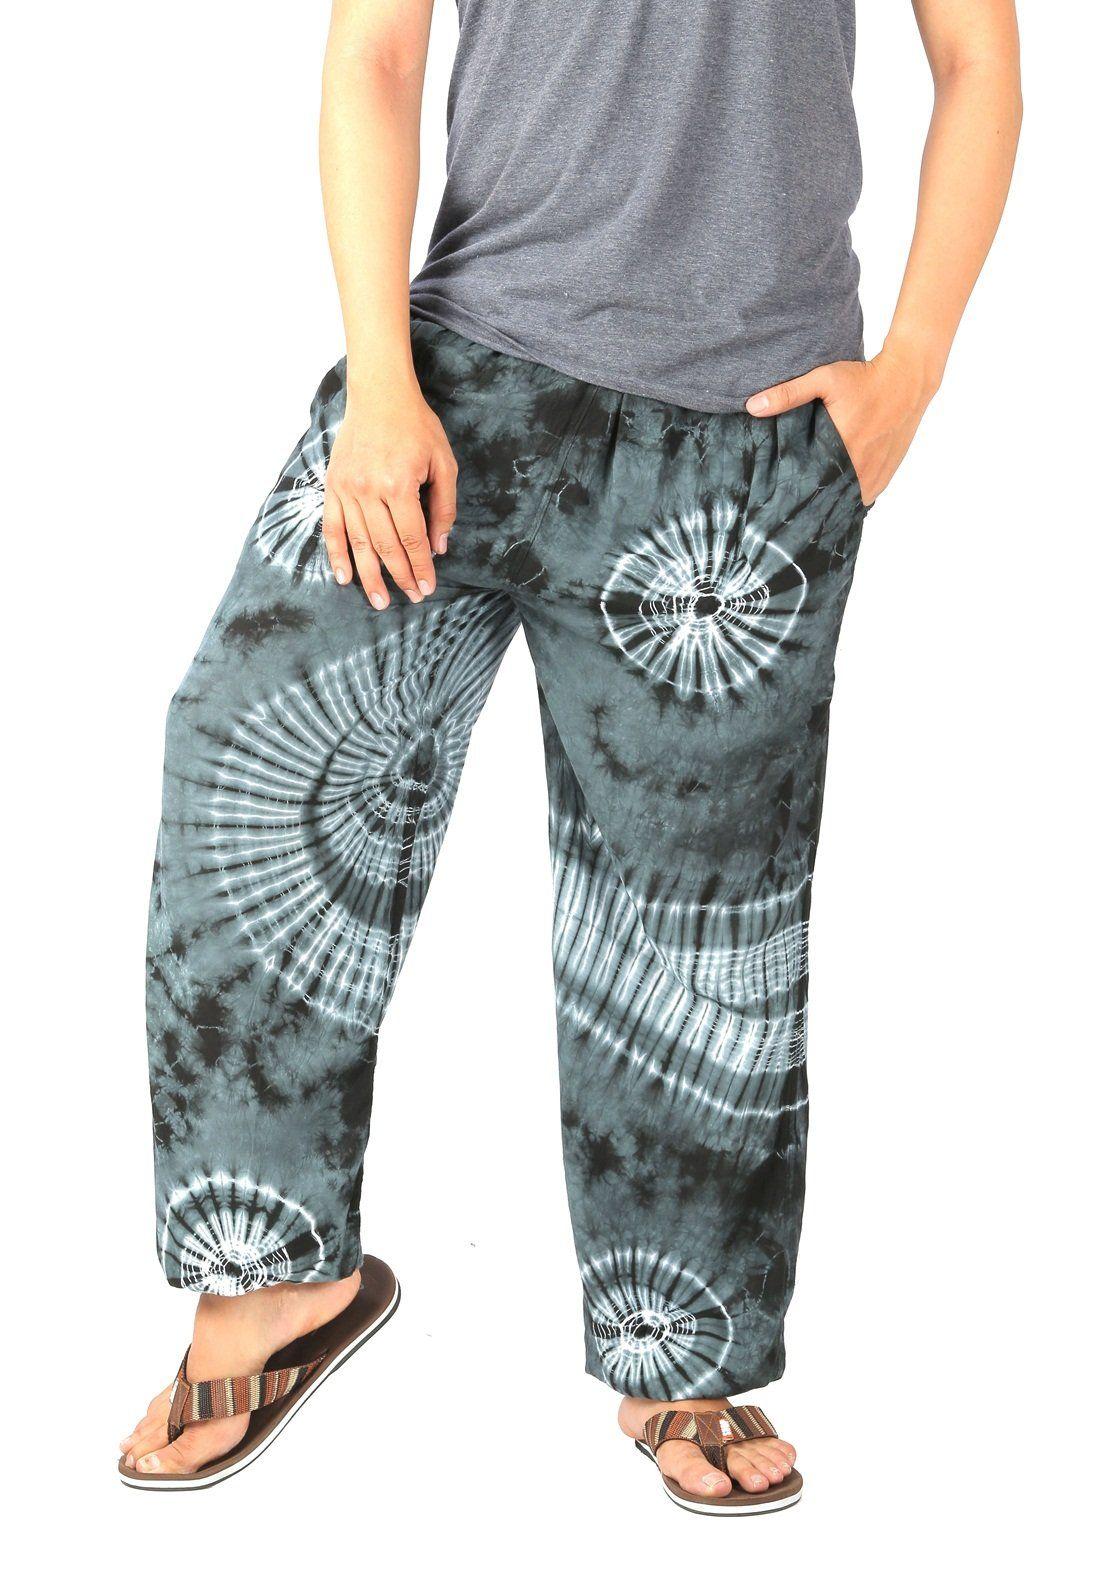 5b9edb8a00 CandyHusky Men Tie Dye Elastic Waist loose fit Hippie Baggy Joggers Yoga  Pants (S/